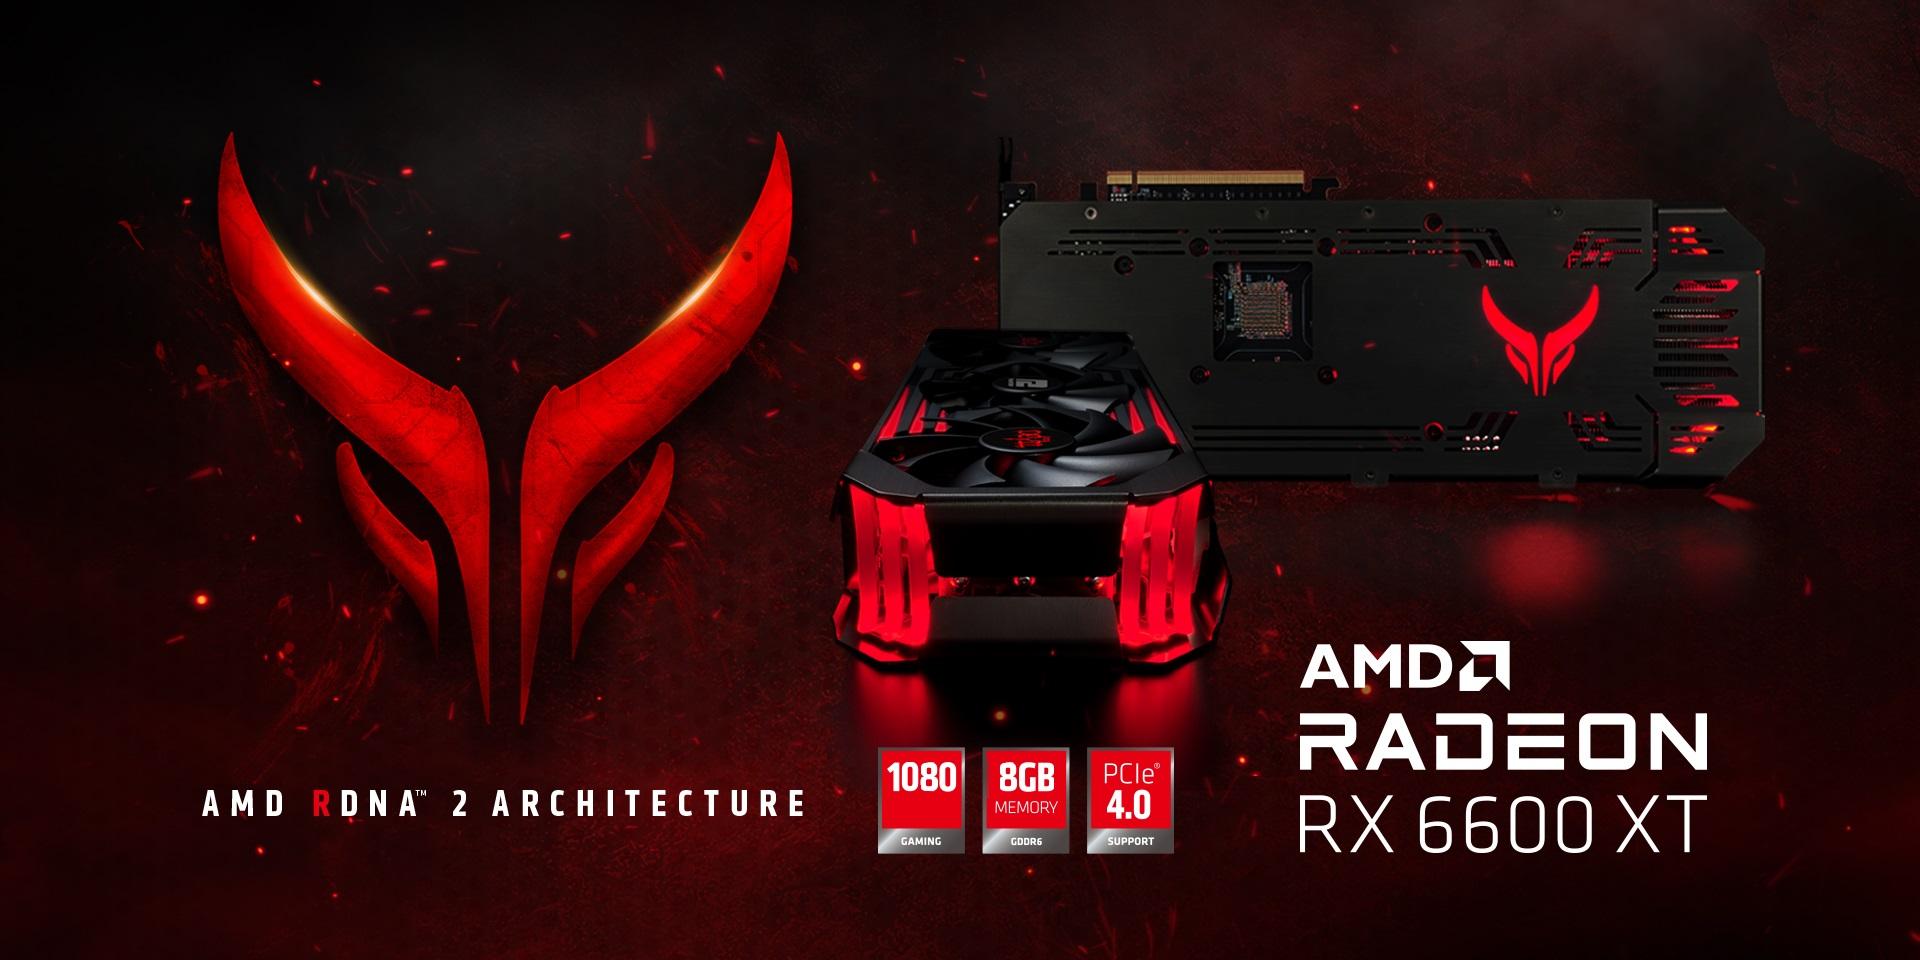 PowerColor Files Radeon RX 6600 series to EEC